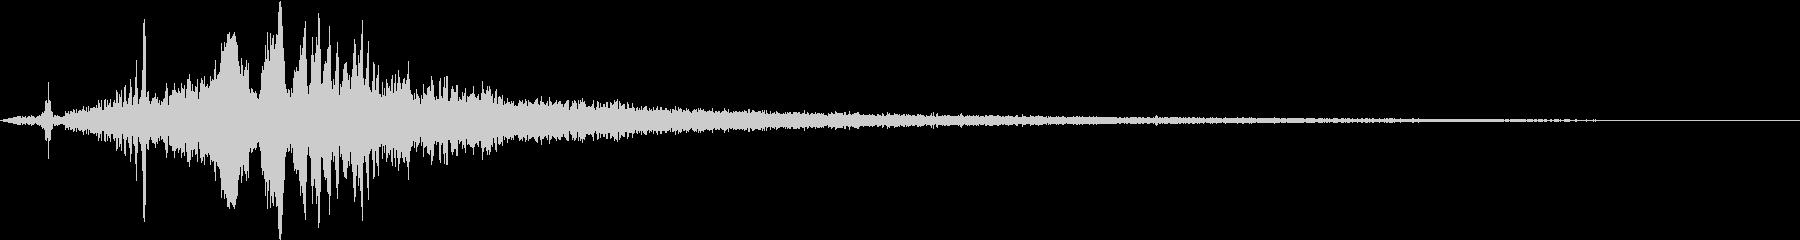 TV RADIO SFX4 チャプターの未再生の波形